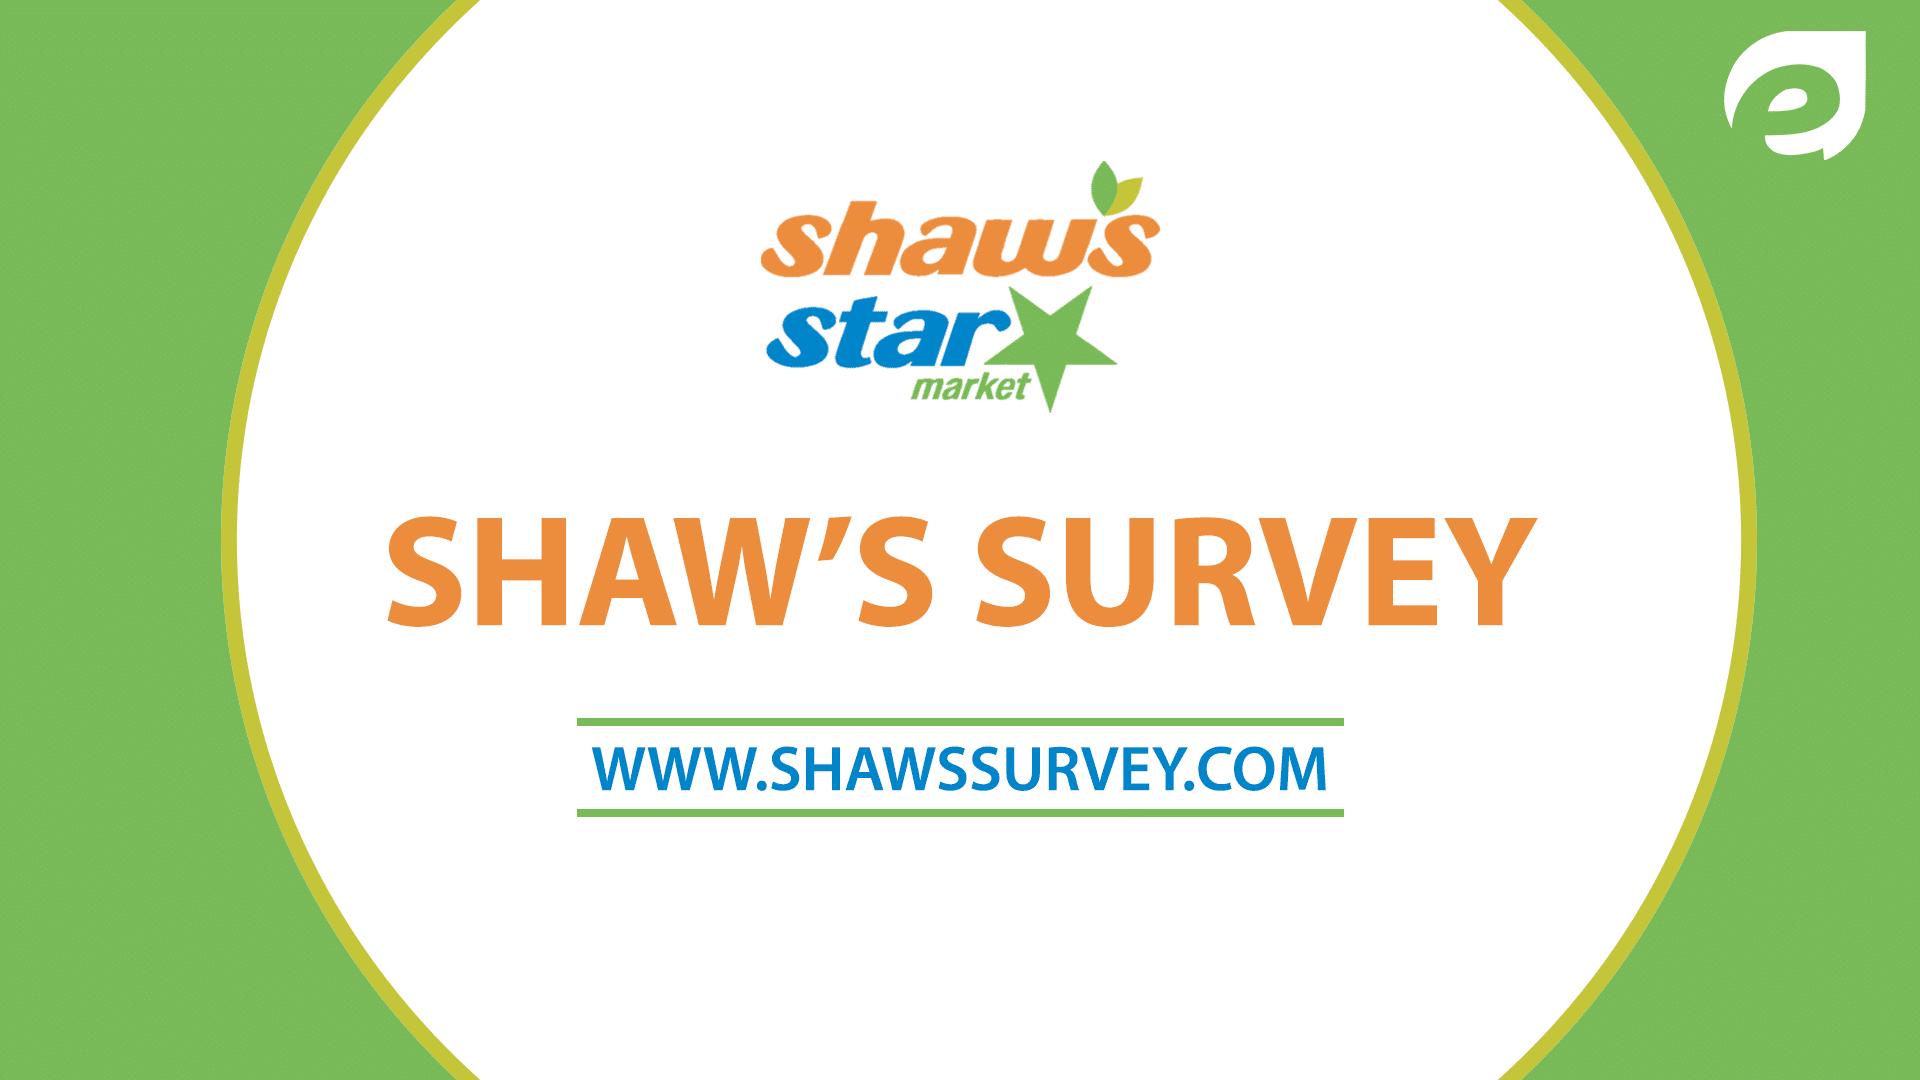 shaw's survey